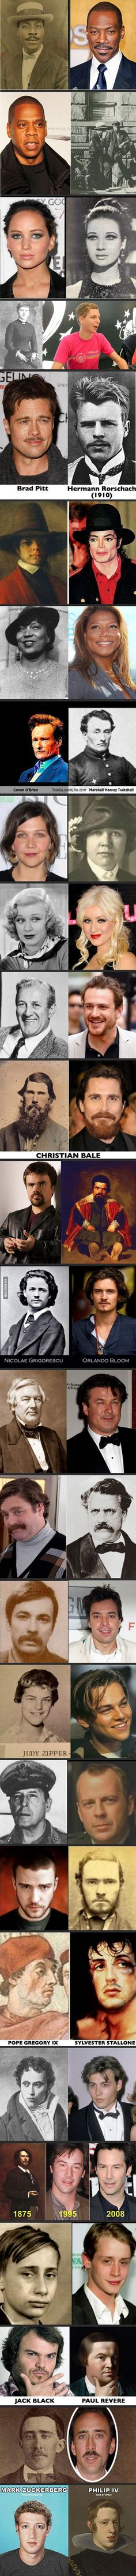 Celebrity Reincarnations